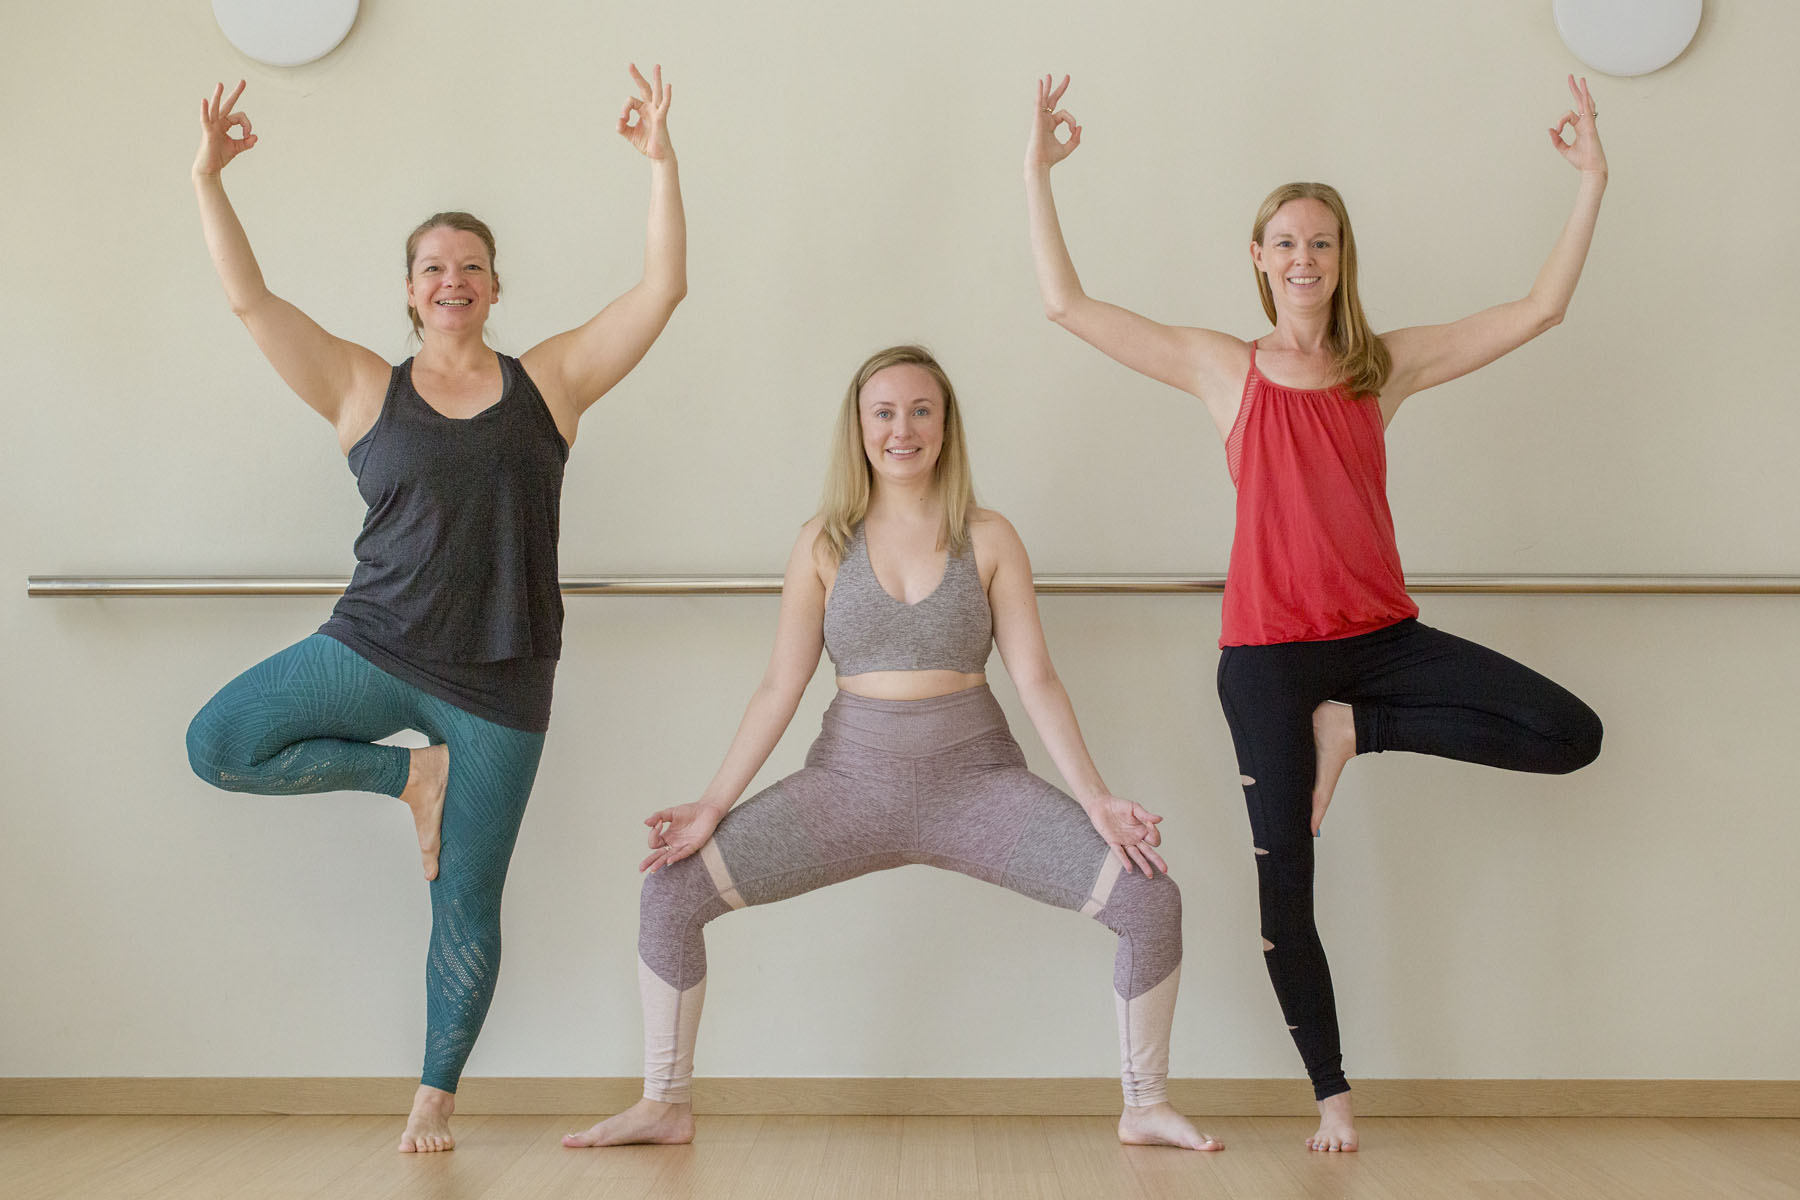 Lezanne, Kausandra & Heather